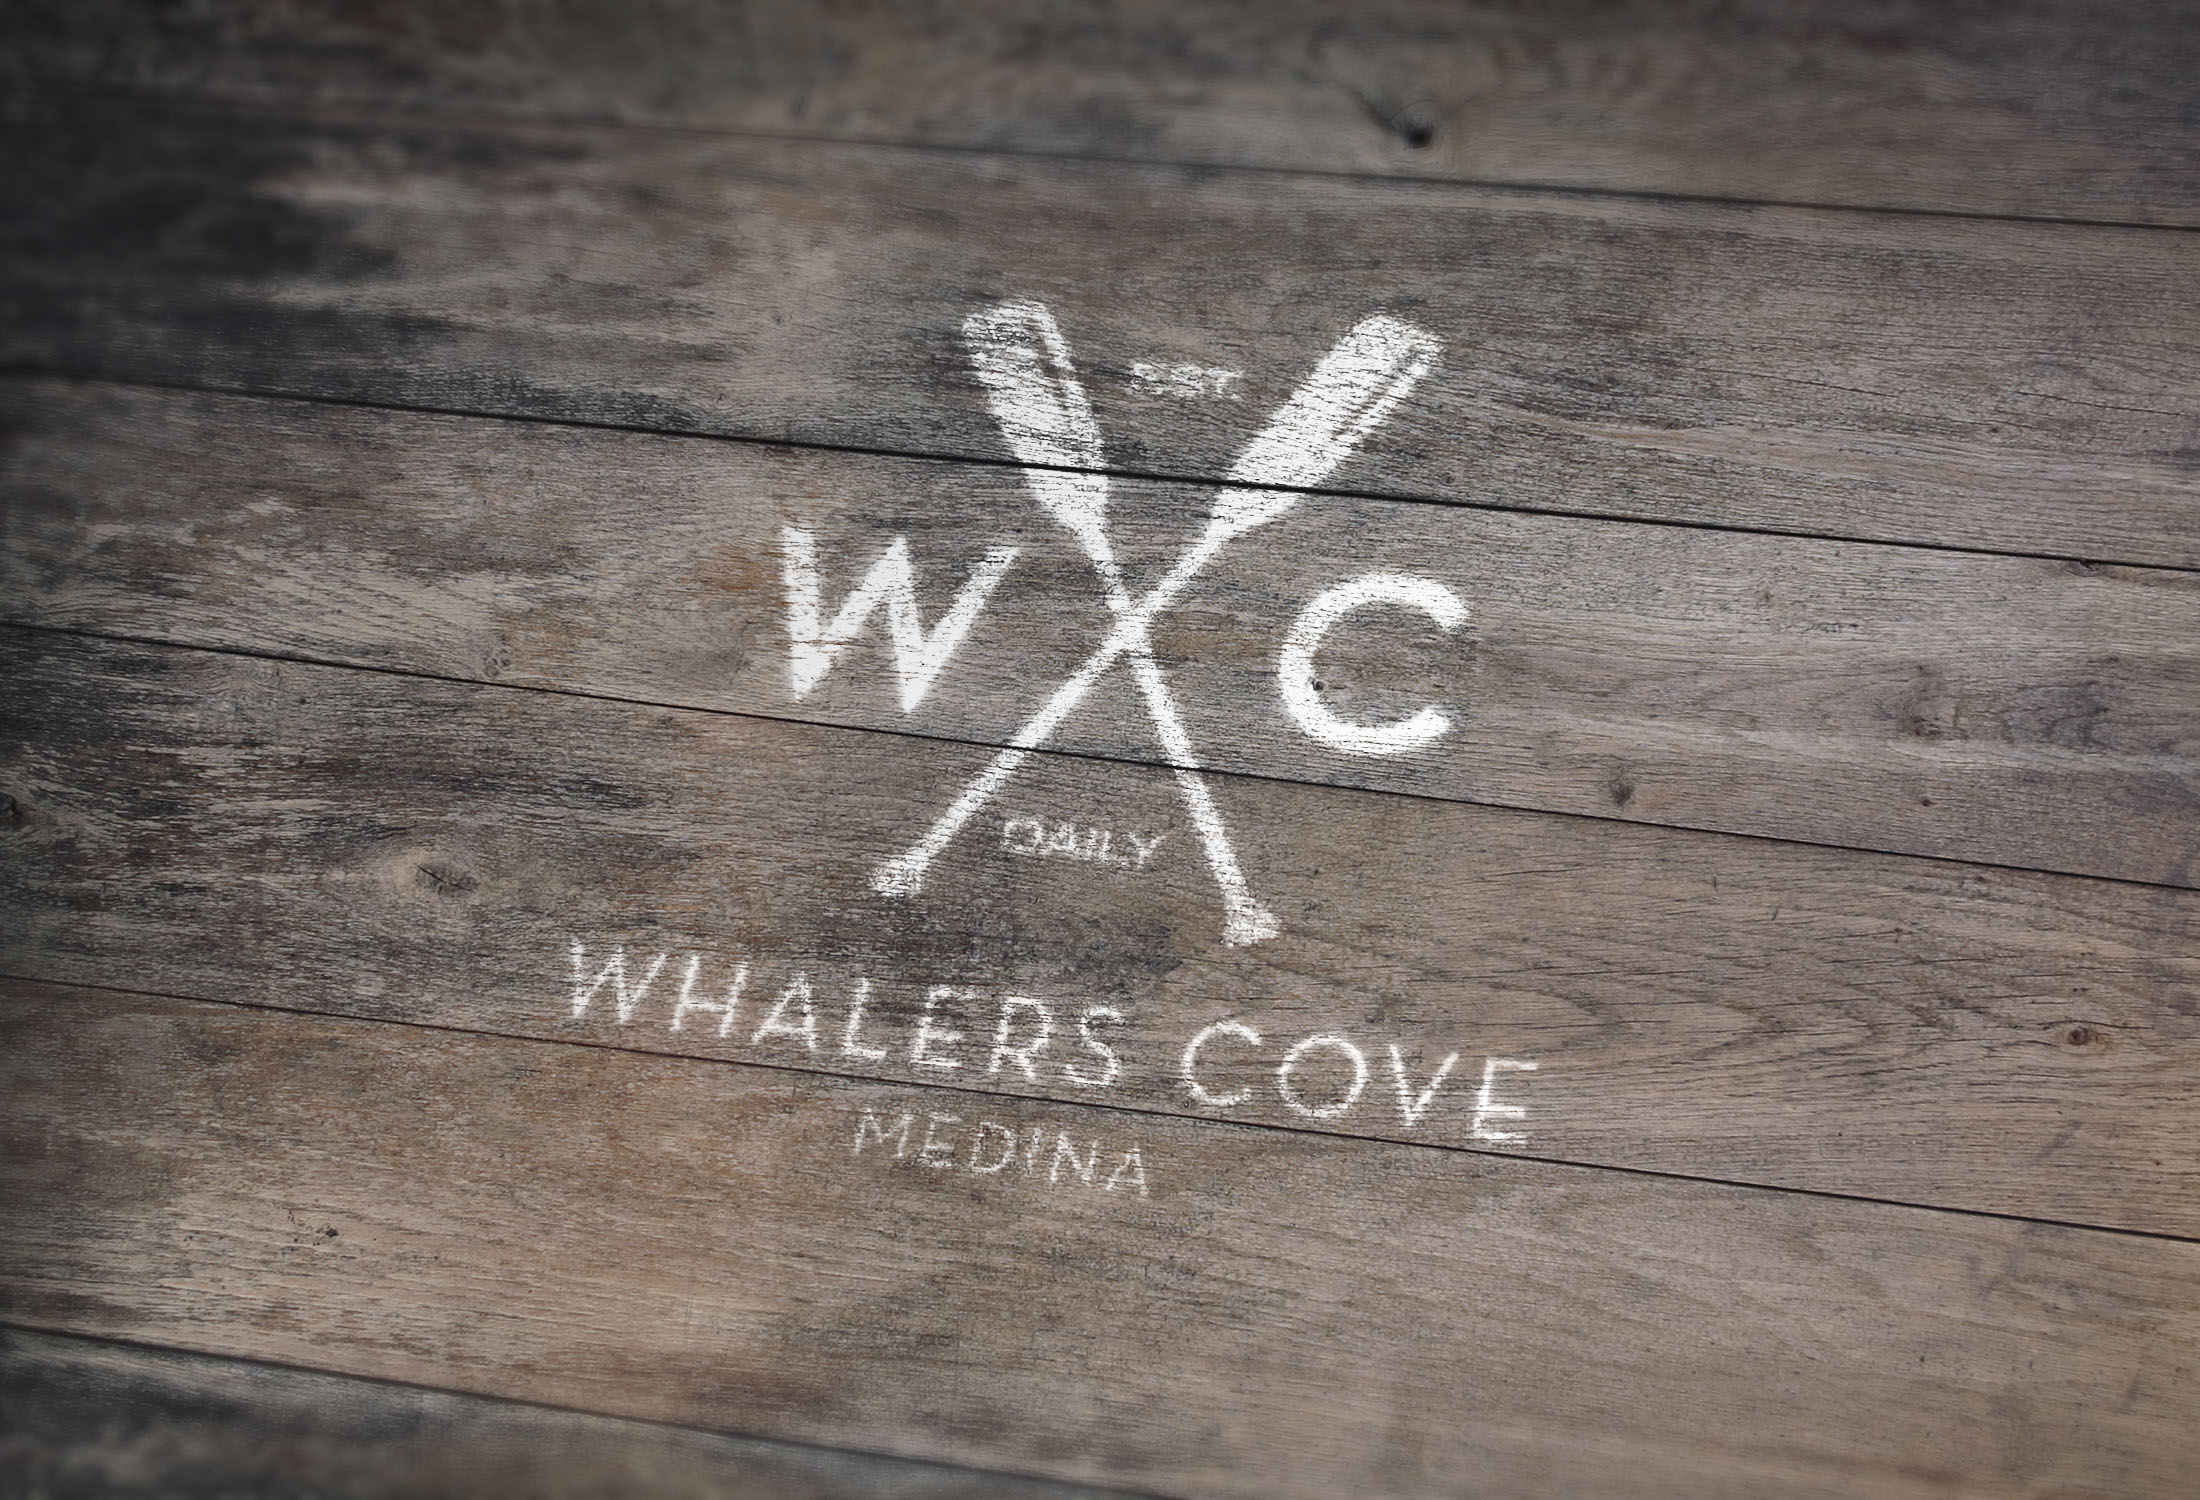 WhalersCoveLogo copy.jpg